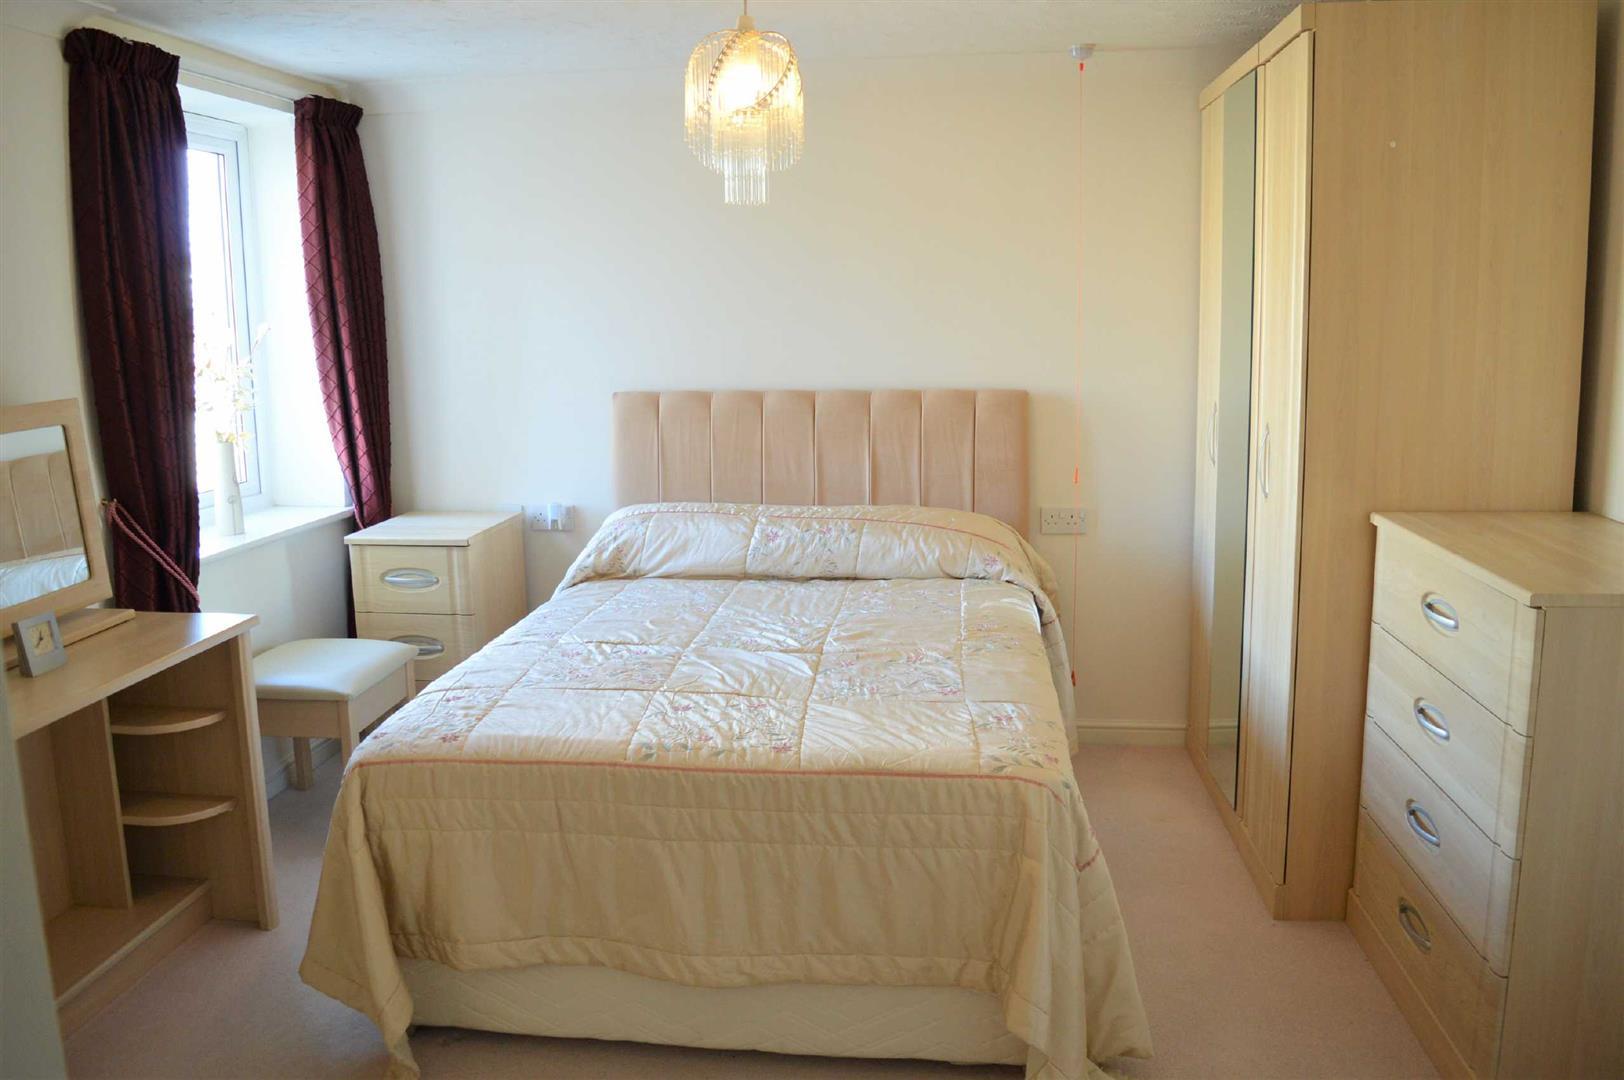 Morgan Court, St Helen's, Swansea, SA1 3UP